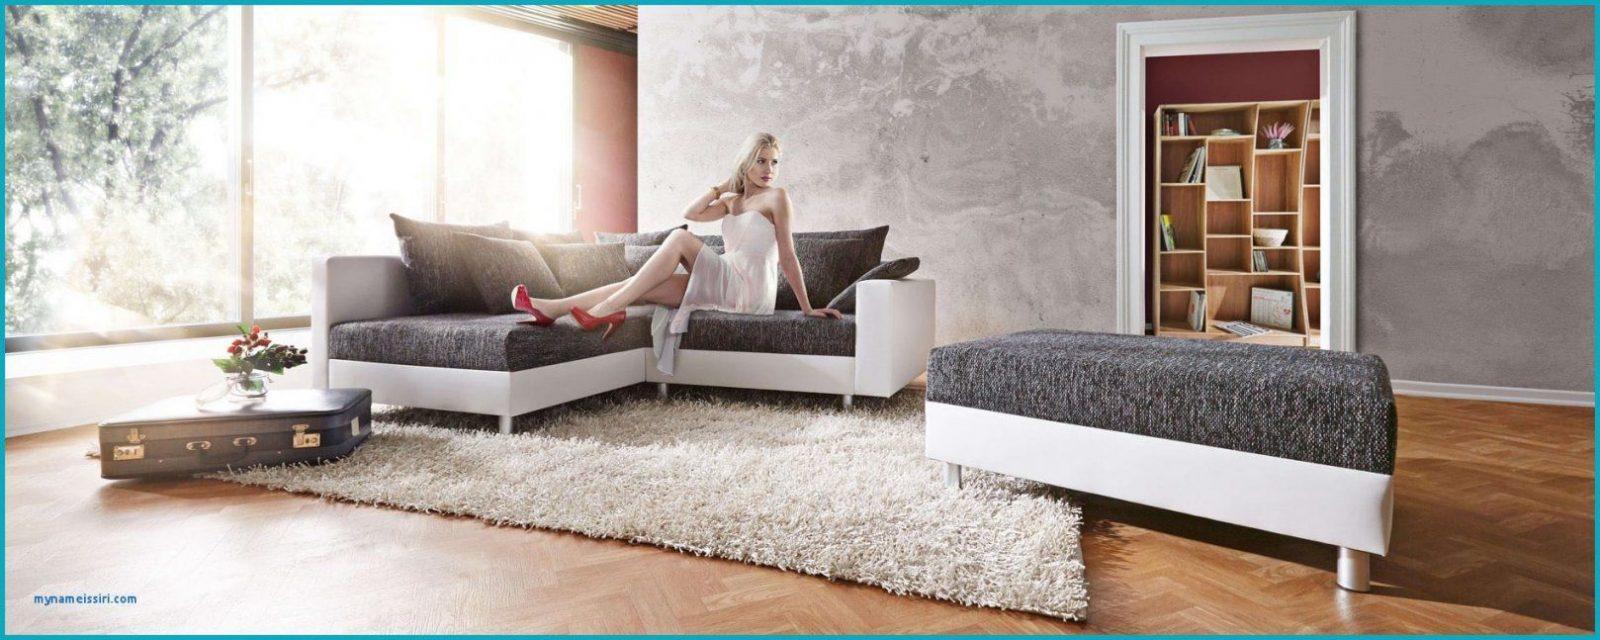 Sofa Auf Raten Trotz Schufa Perfect Gnstige Schlafsofas Auf Raten von Sofa Auf Raten Trotz Schufa Bild